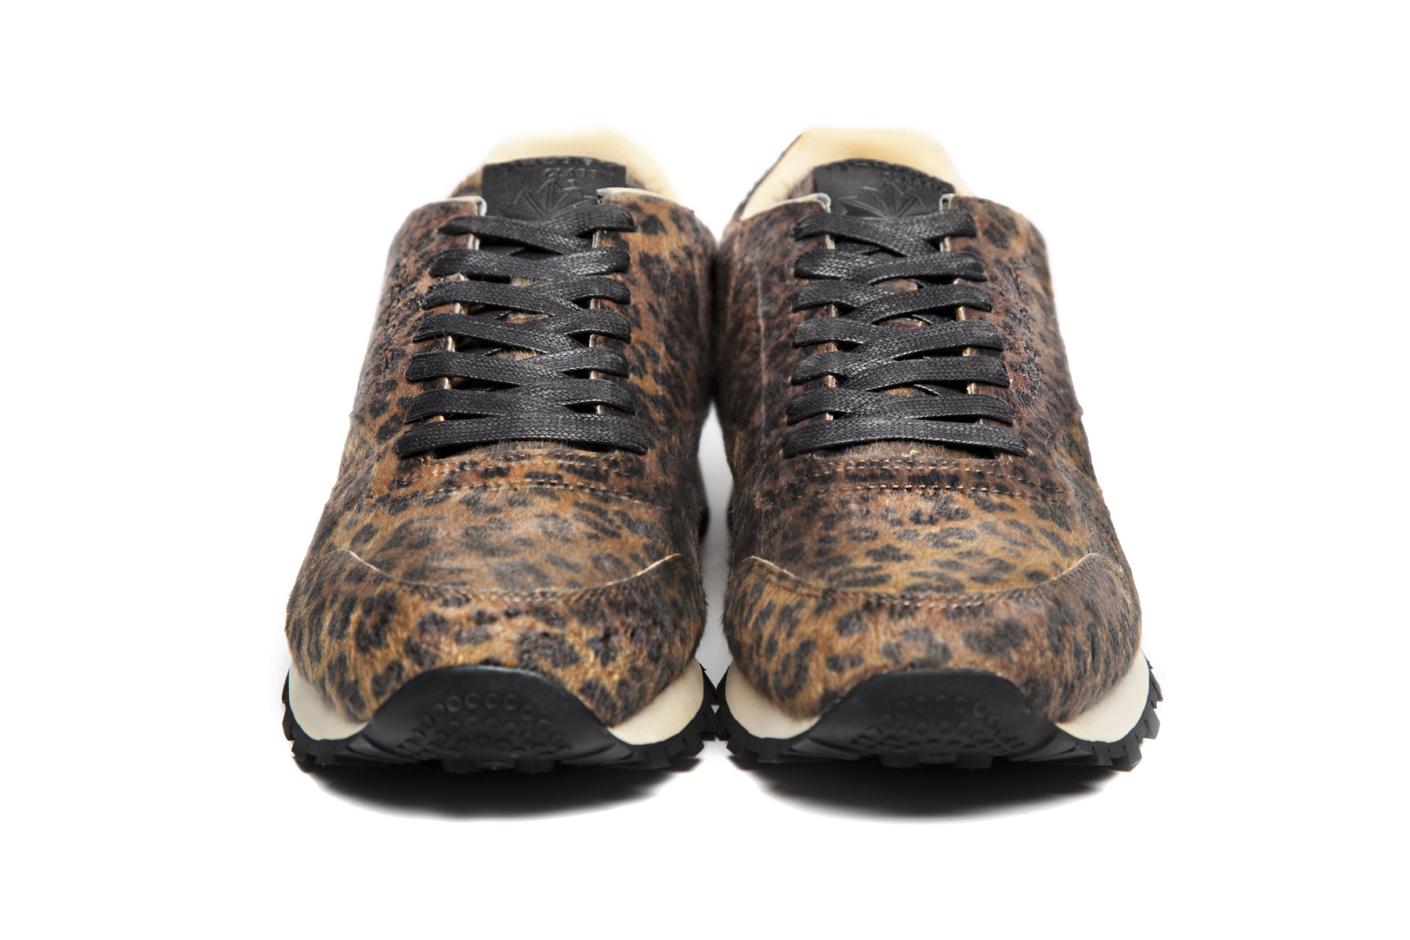 2fd4eced53 Head Porter Plus x Reebok Classic Leather leopard front